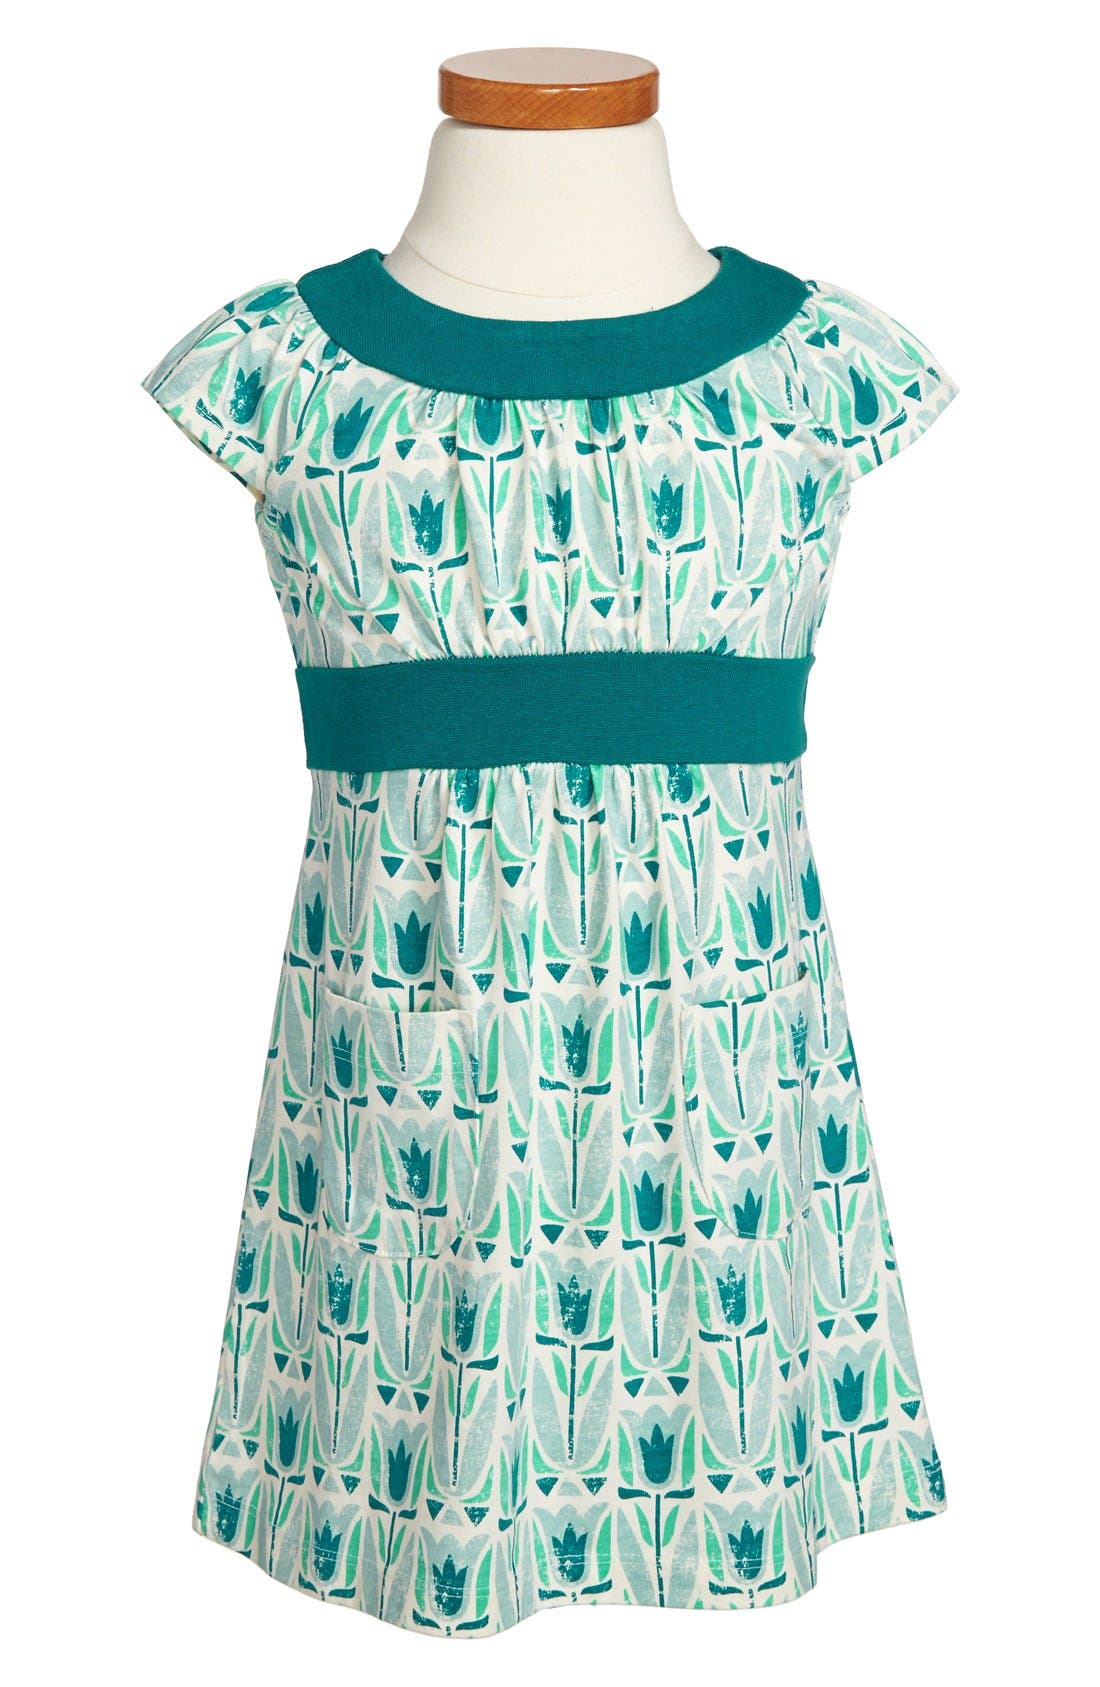 Alternate Image 1 Selected - Tea Collection 'Mod Tulip' Dress (Toddler Girls, Little Girls & Big Girls)